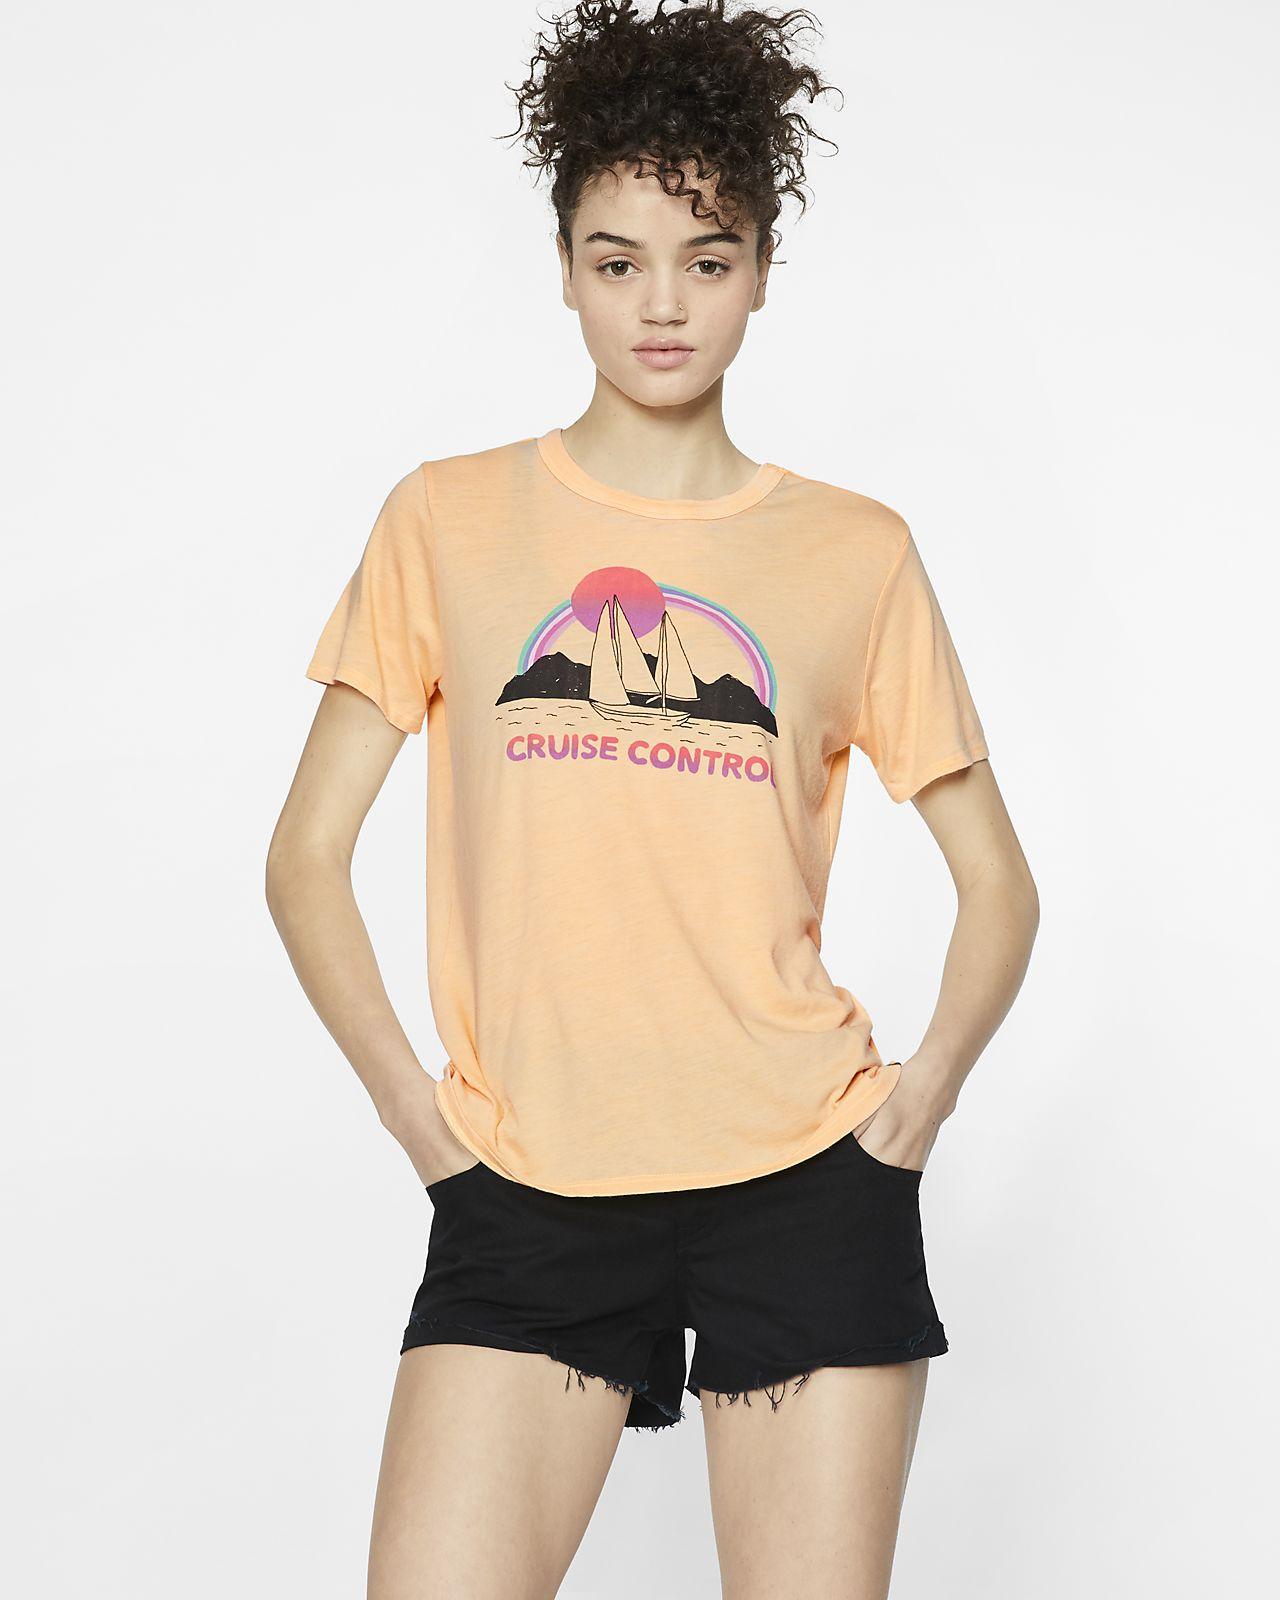 Hurley Cruise Control T-skjorte til dame